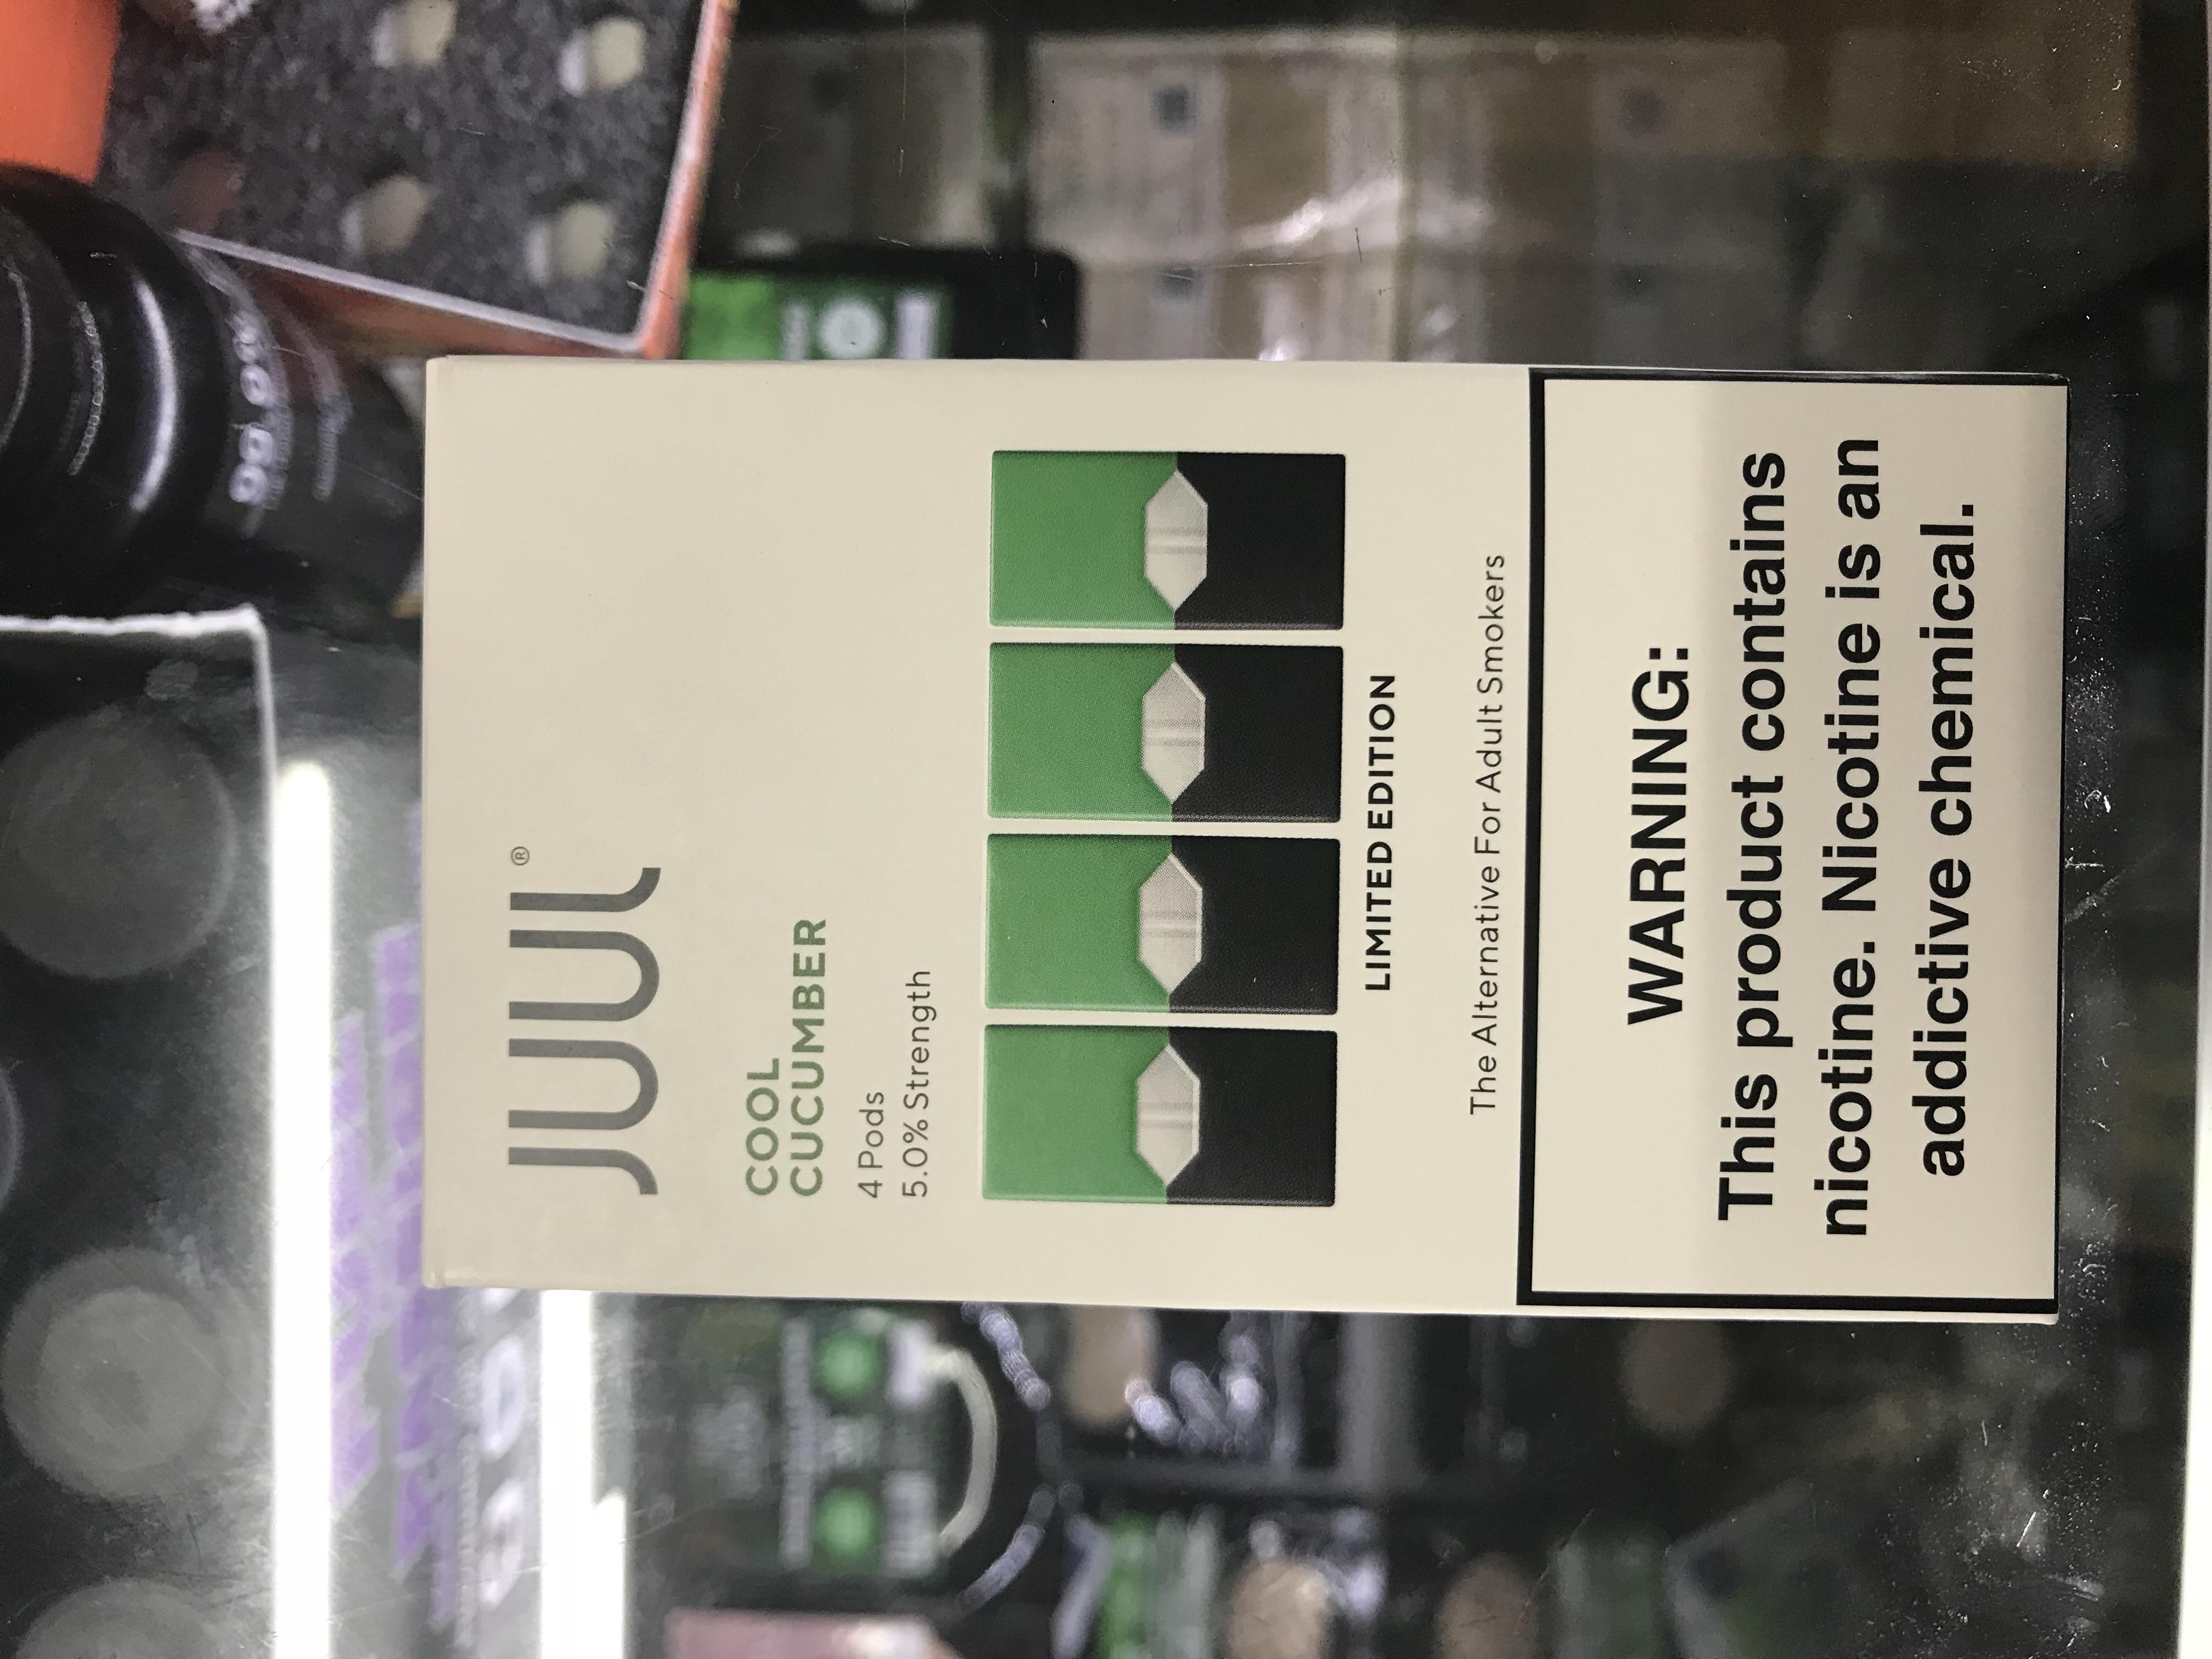 Hitting the JUUL increases nicotine addiction